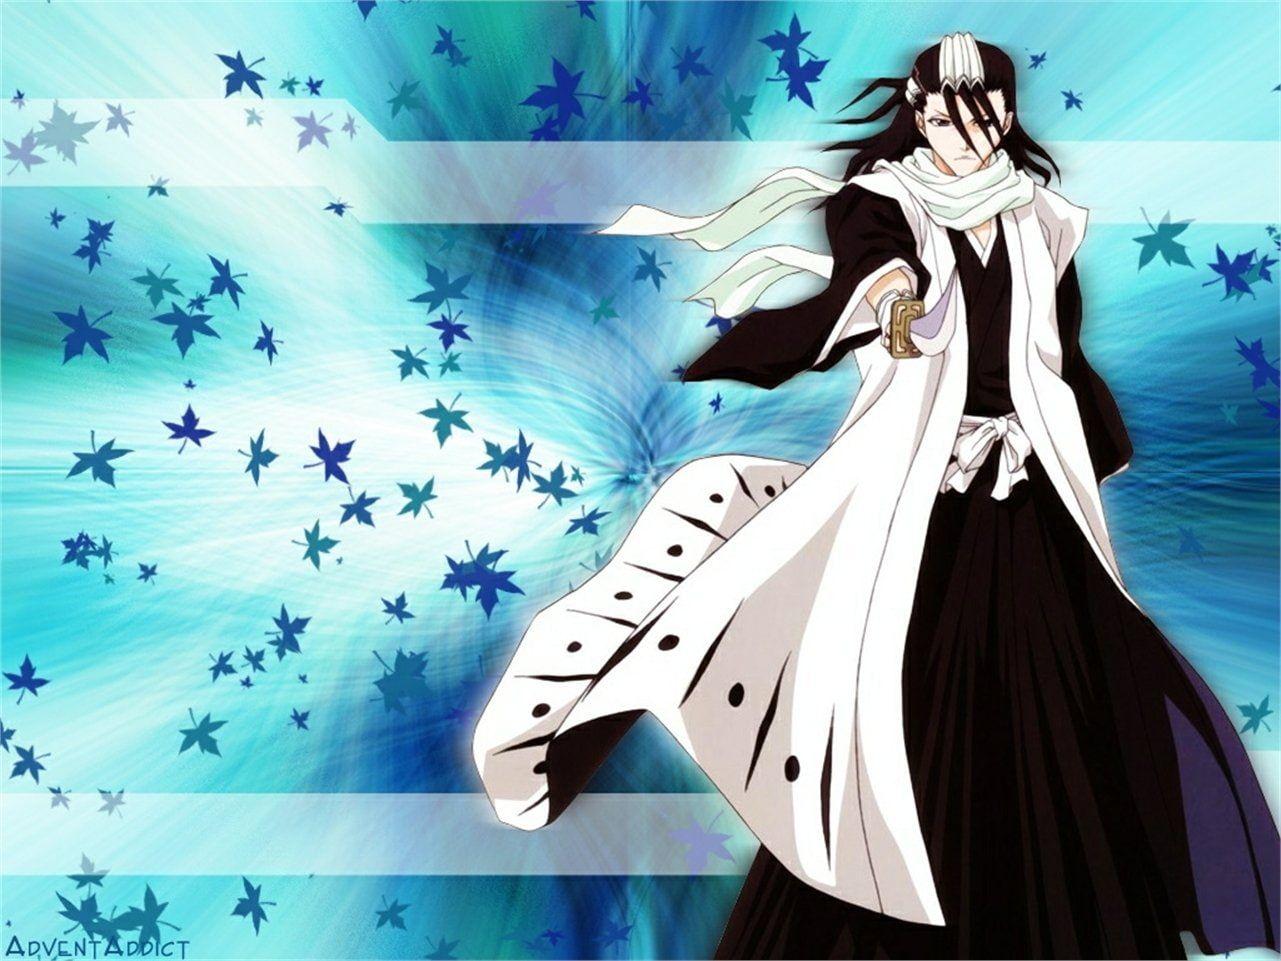 Bleach Byakuya Kuchiki 720p Wallpaper Hdwallpaper Desktop